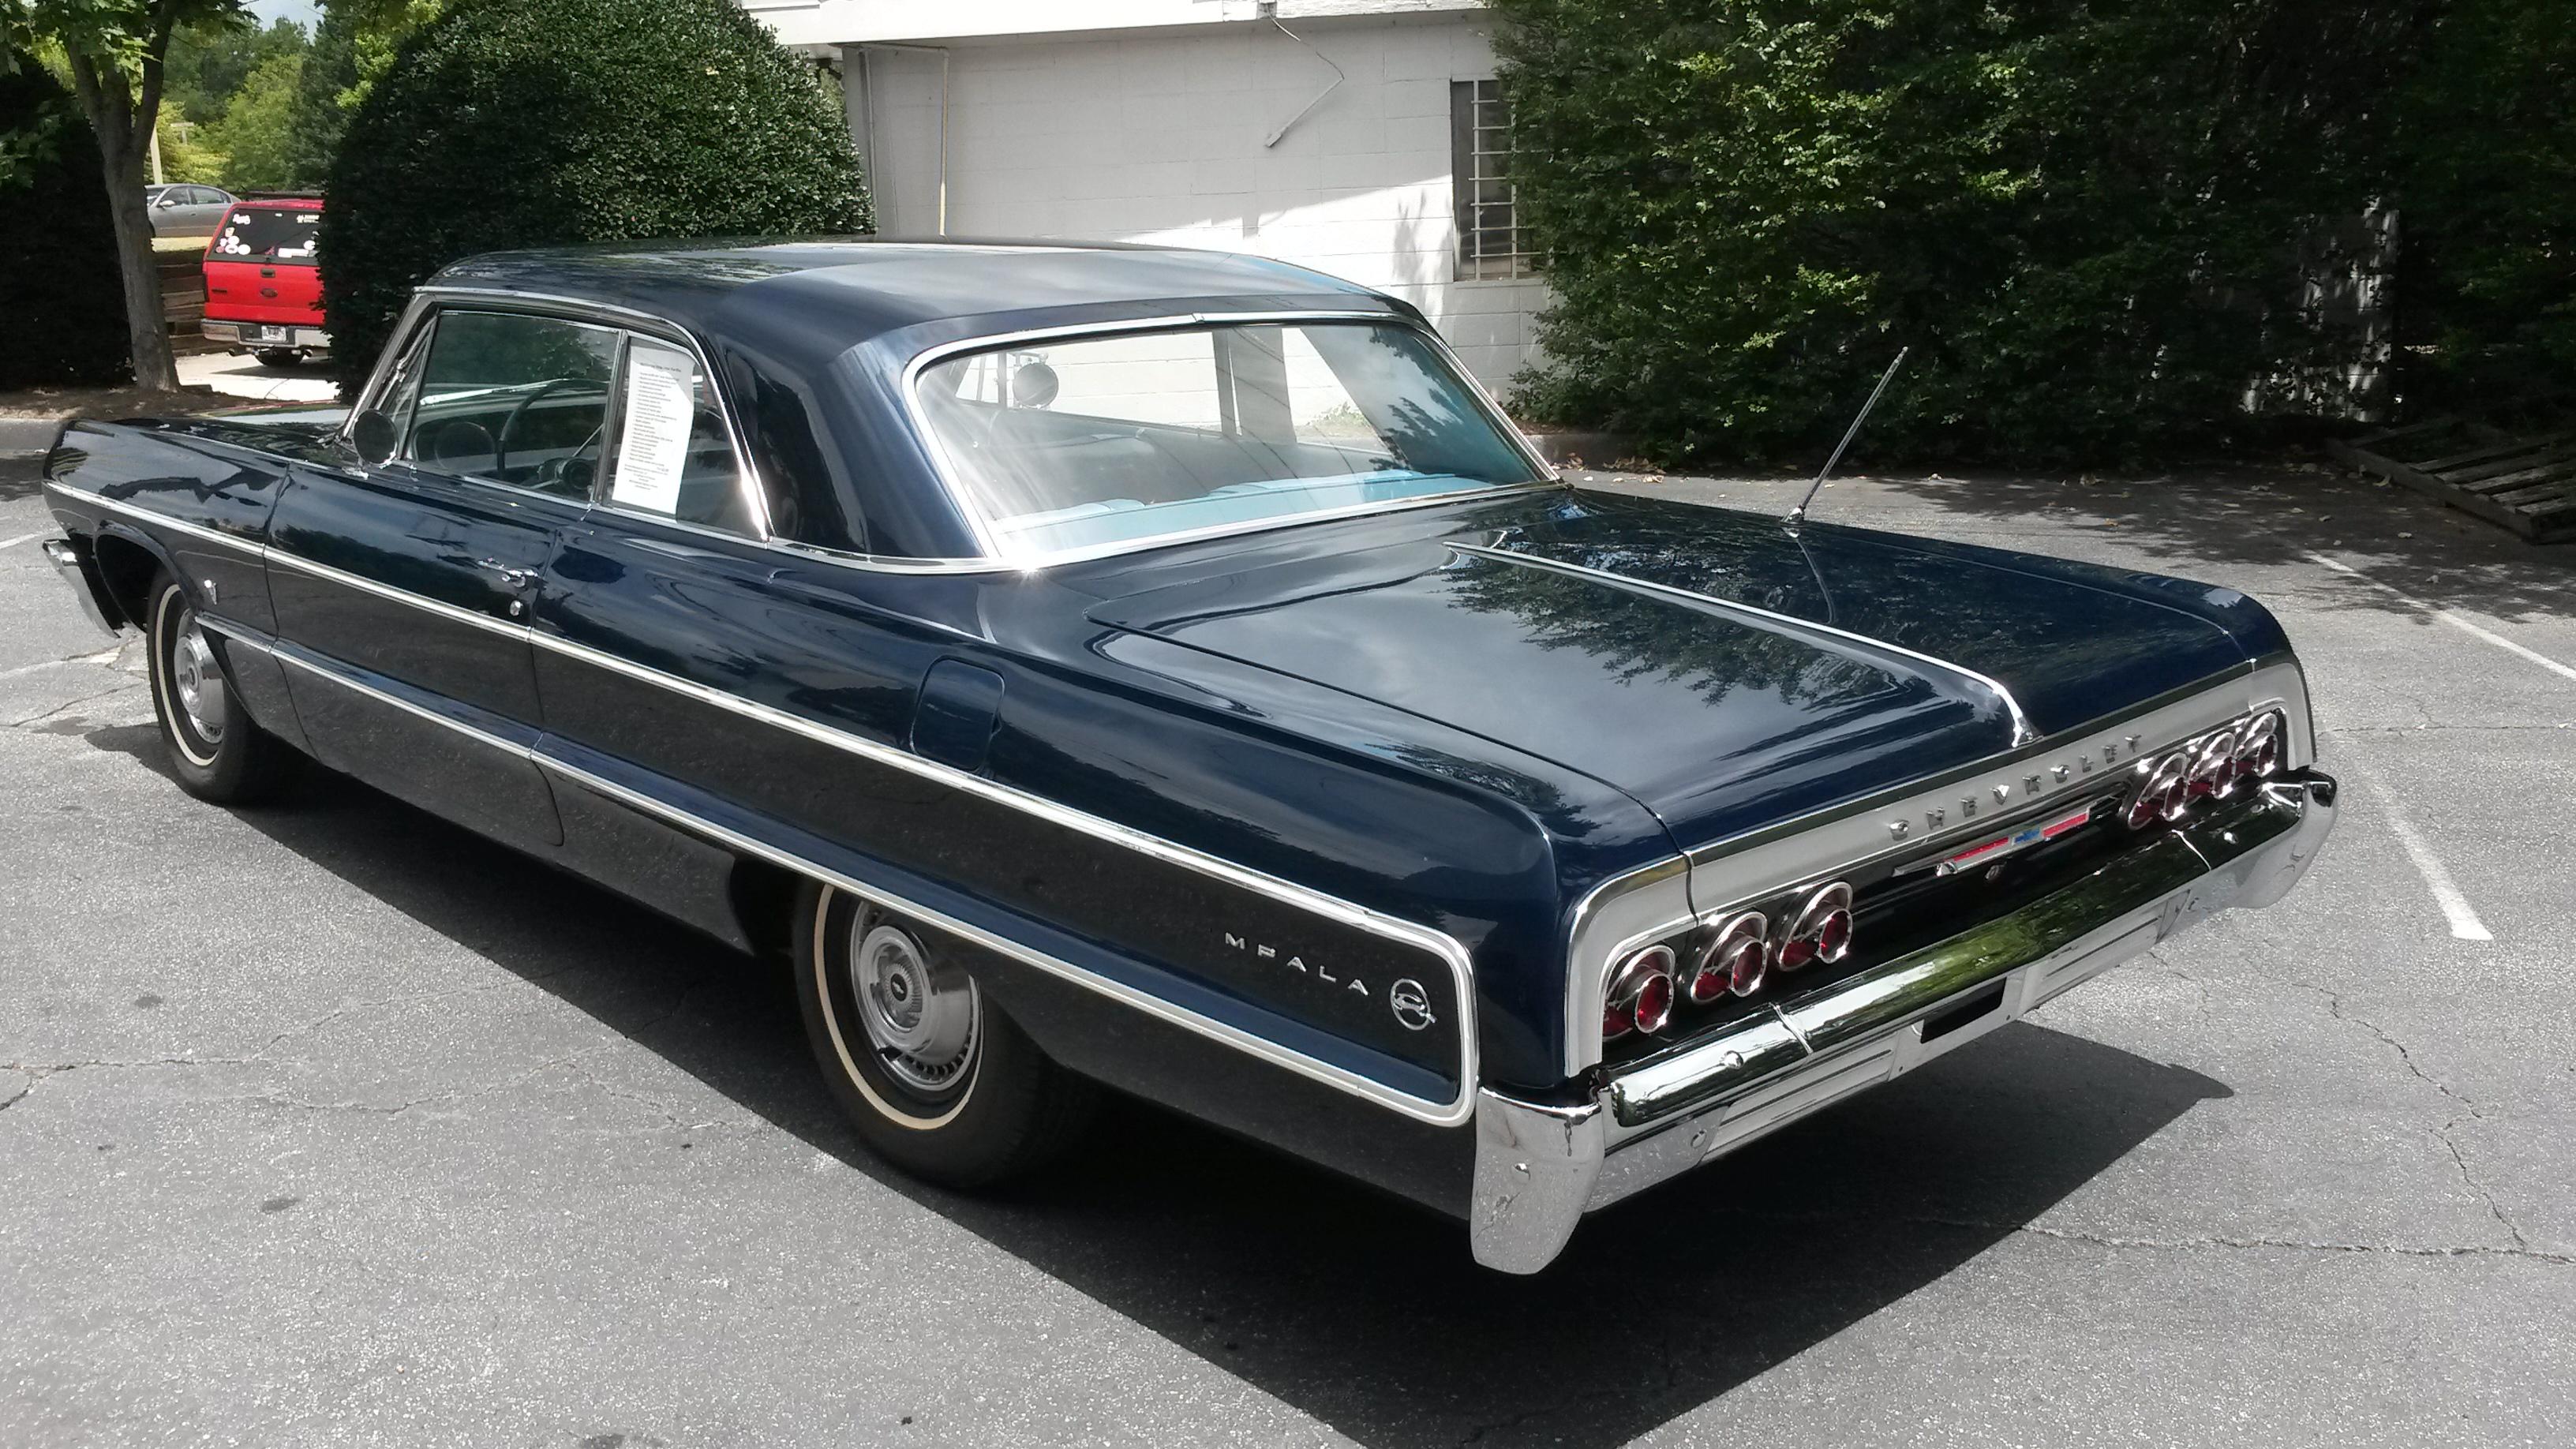 1964 Impala Two Door Hardtop (9)